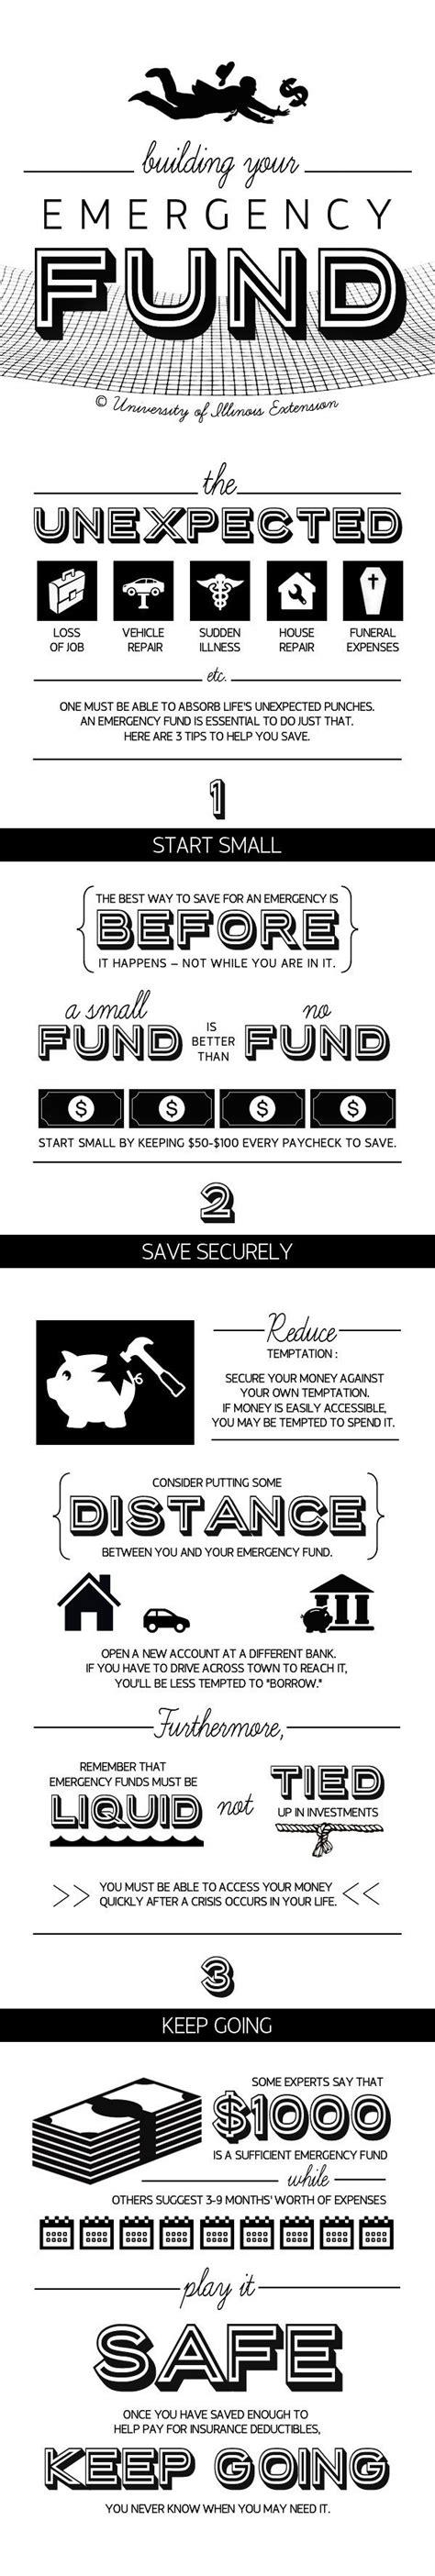 primerica business card template card primerica business template cover letter business